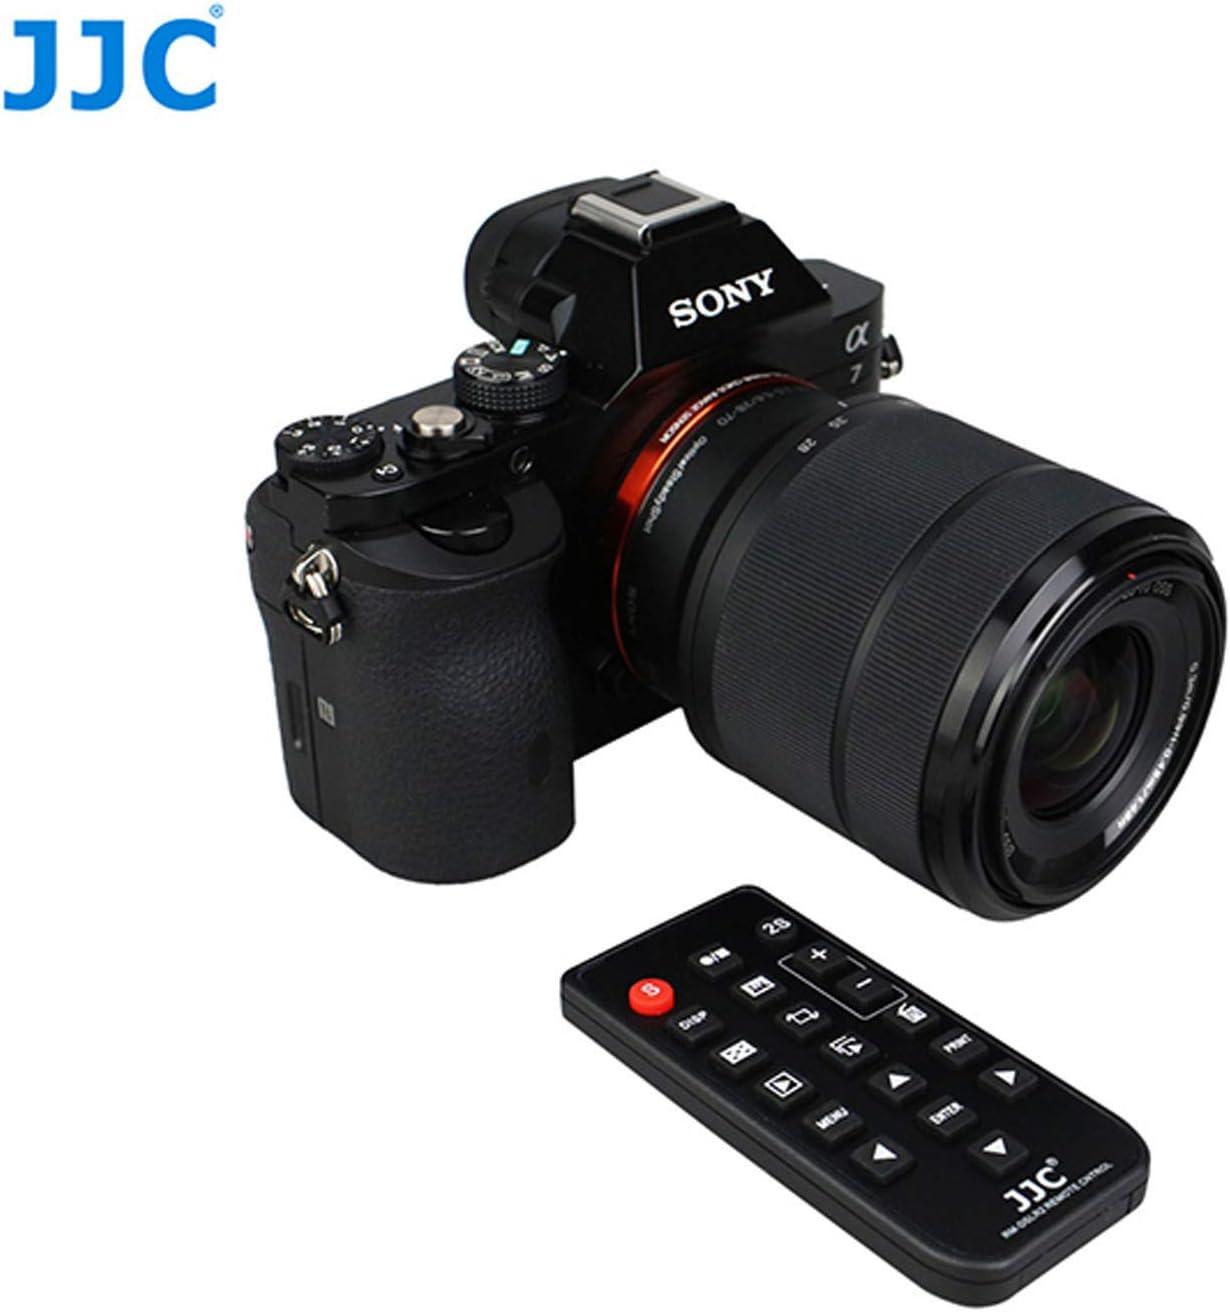 Telecamera cavo HDMI 1,5m per Sony Alpha slt-a57